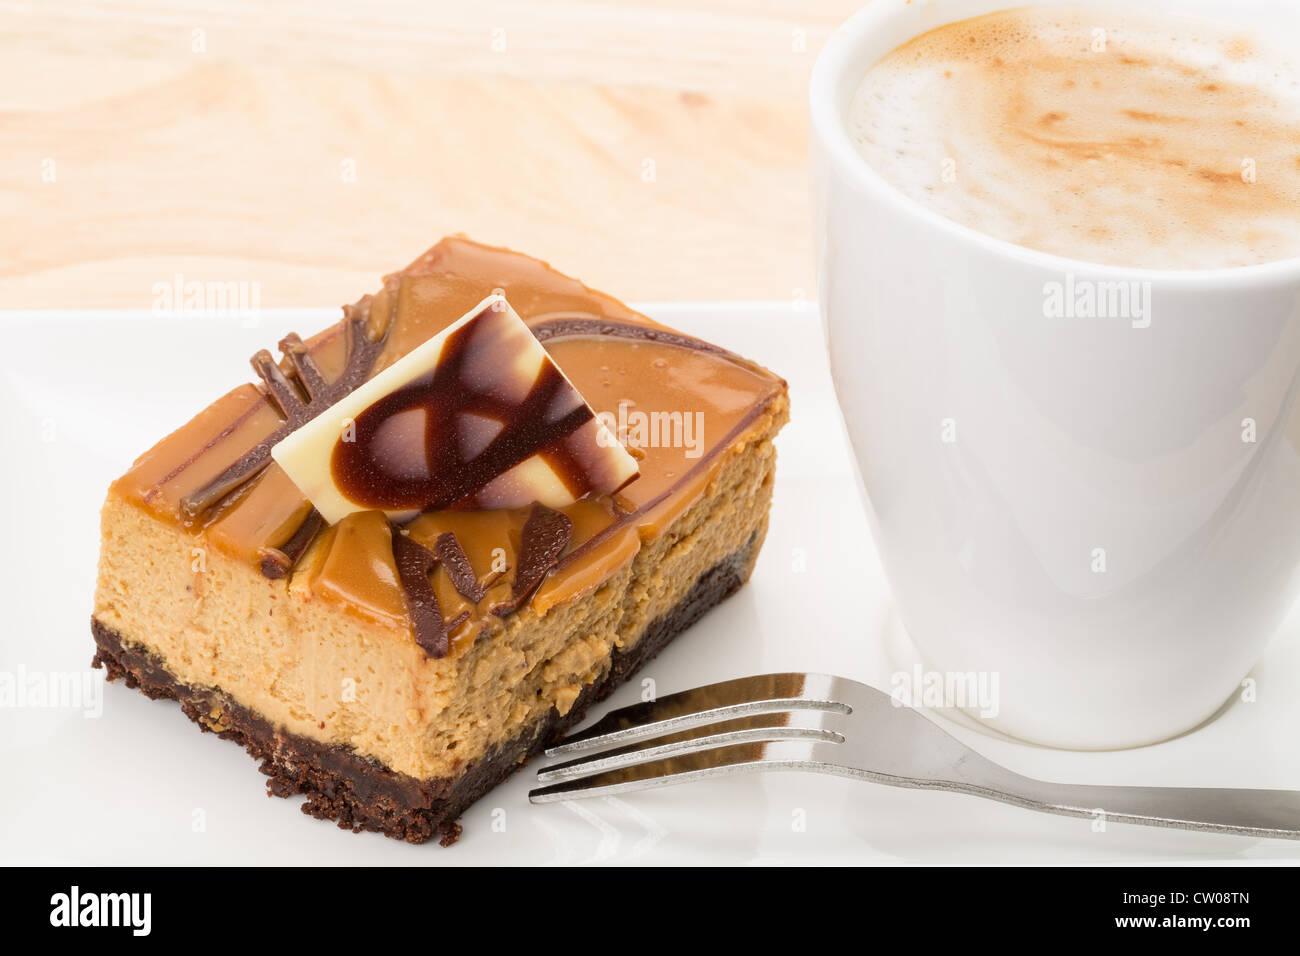 Stück Karamell Käsekuchen mit einer Tasse Kaffee - Studio gedreht Stockbild